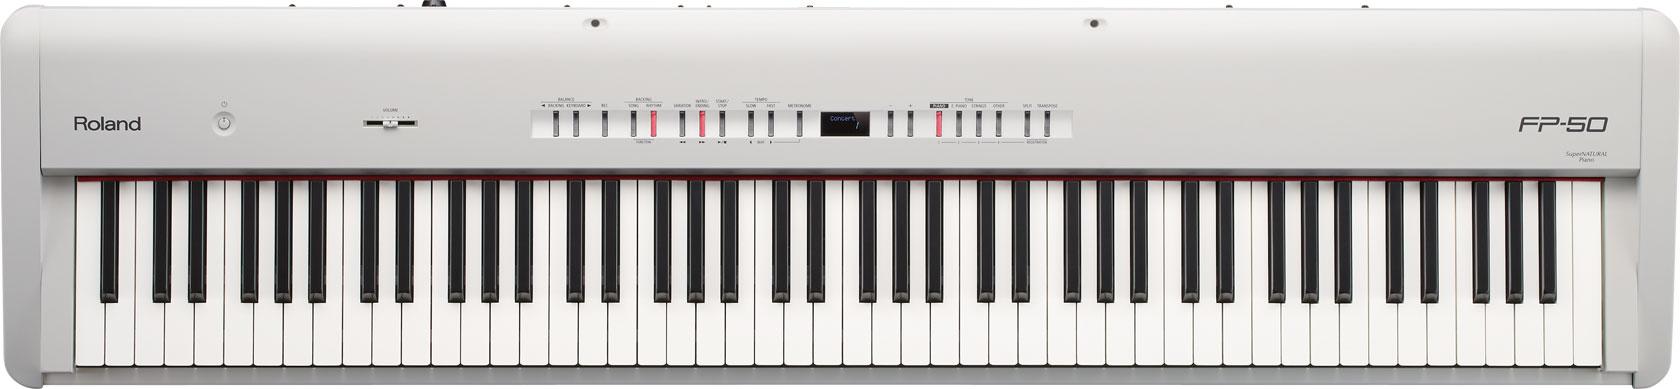 Roland Fp 50 Digital Piano